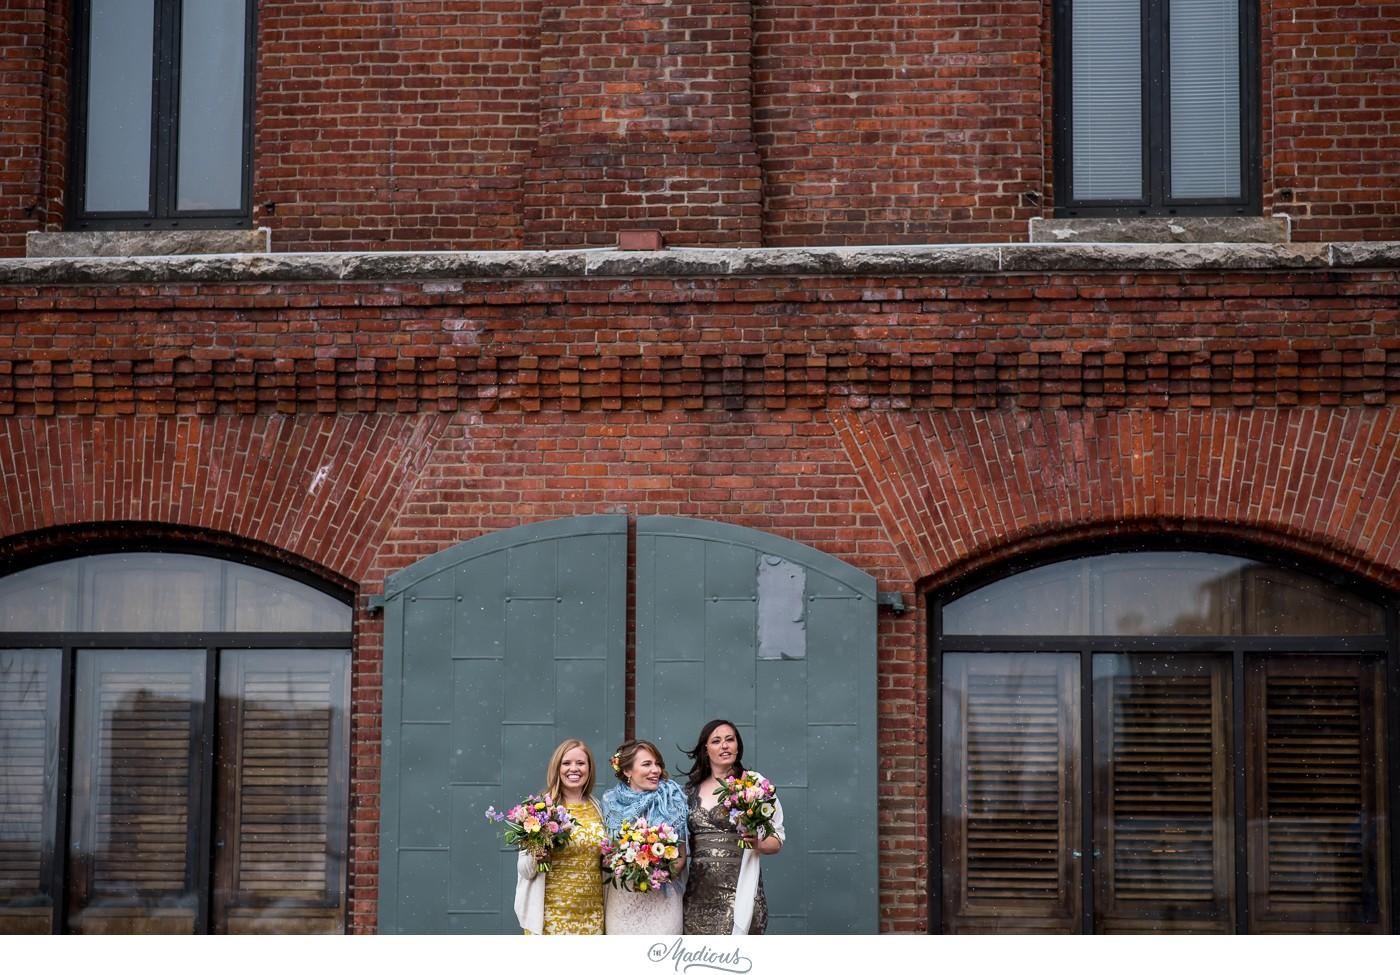 Coradetti_Glass_Spring_Wedding_08.JPG